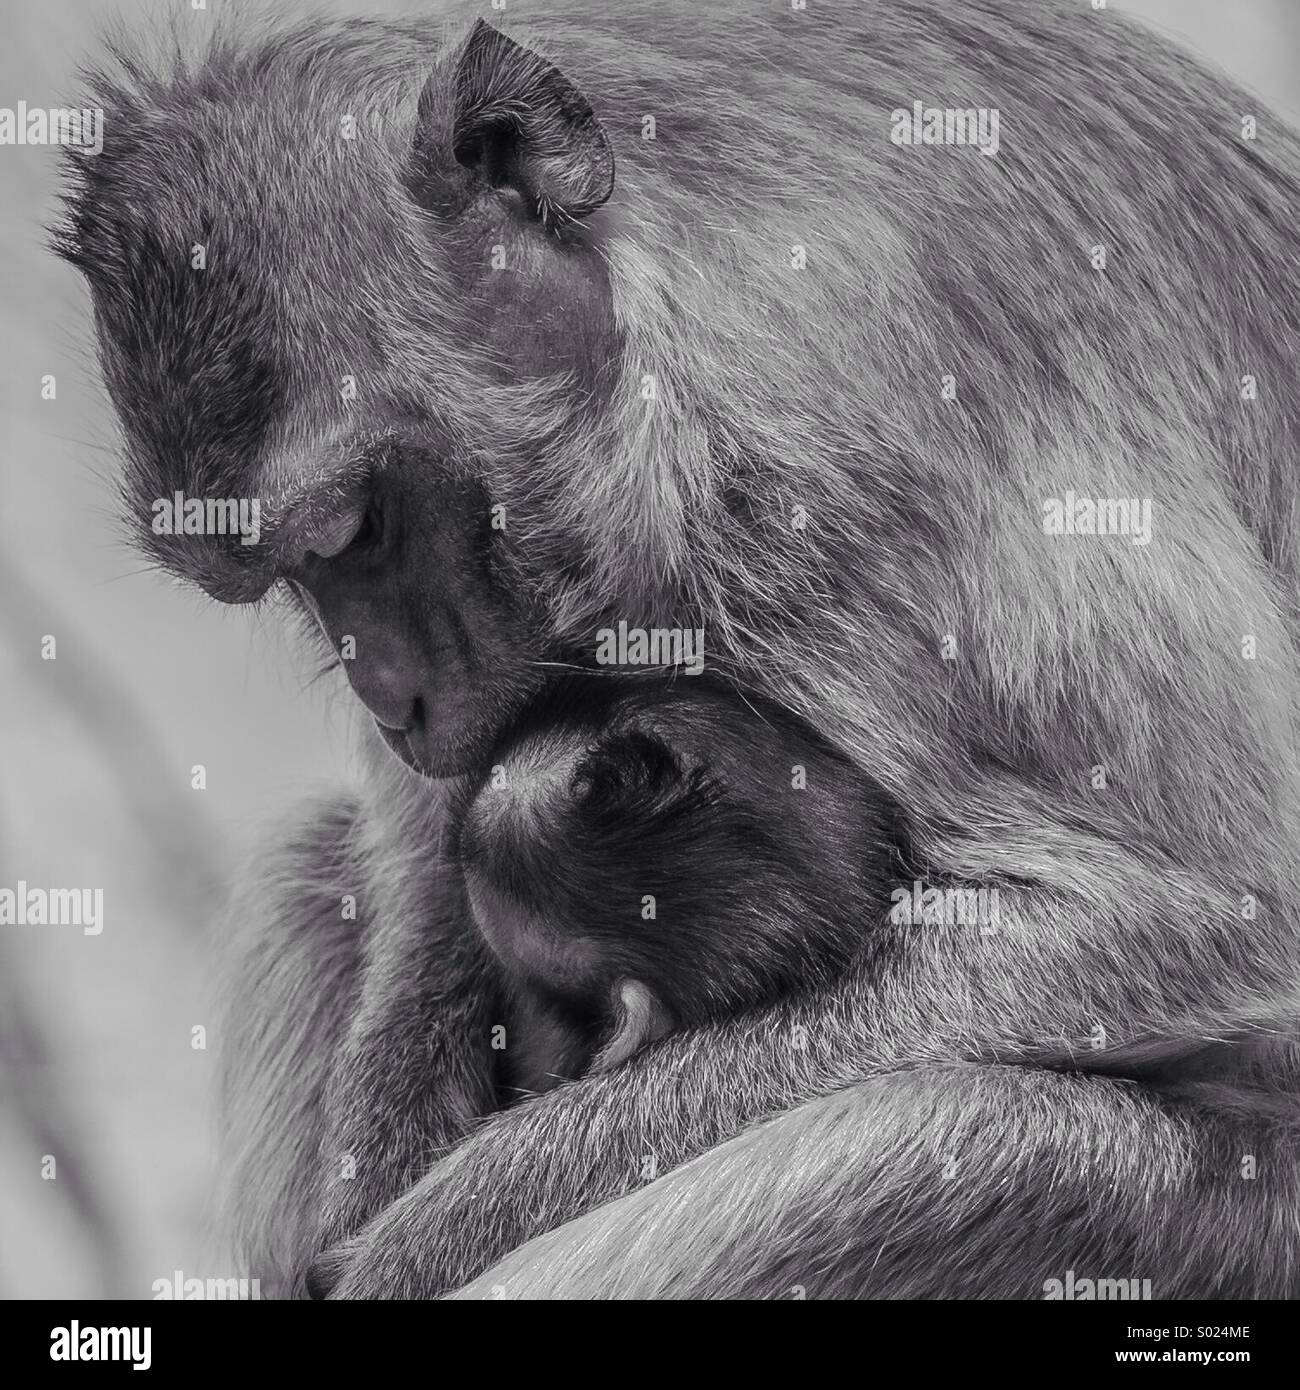 Monkey love - Stock Image